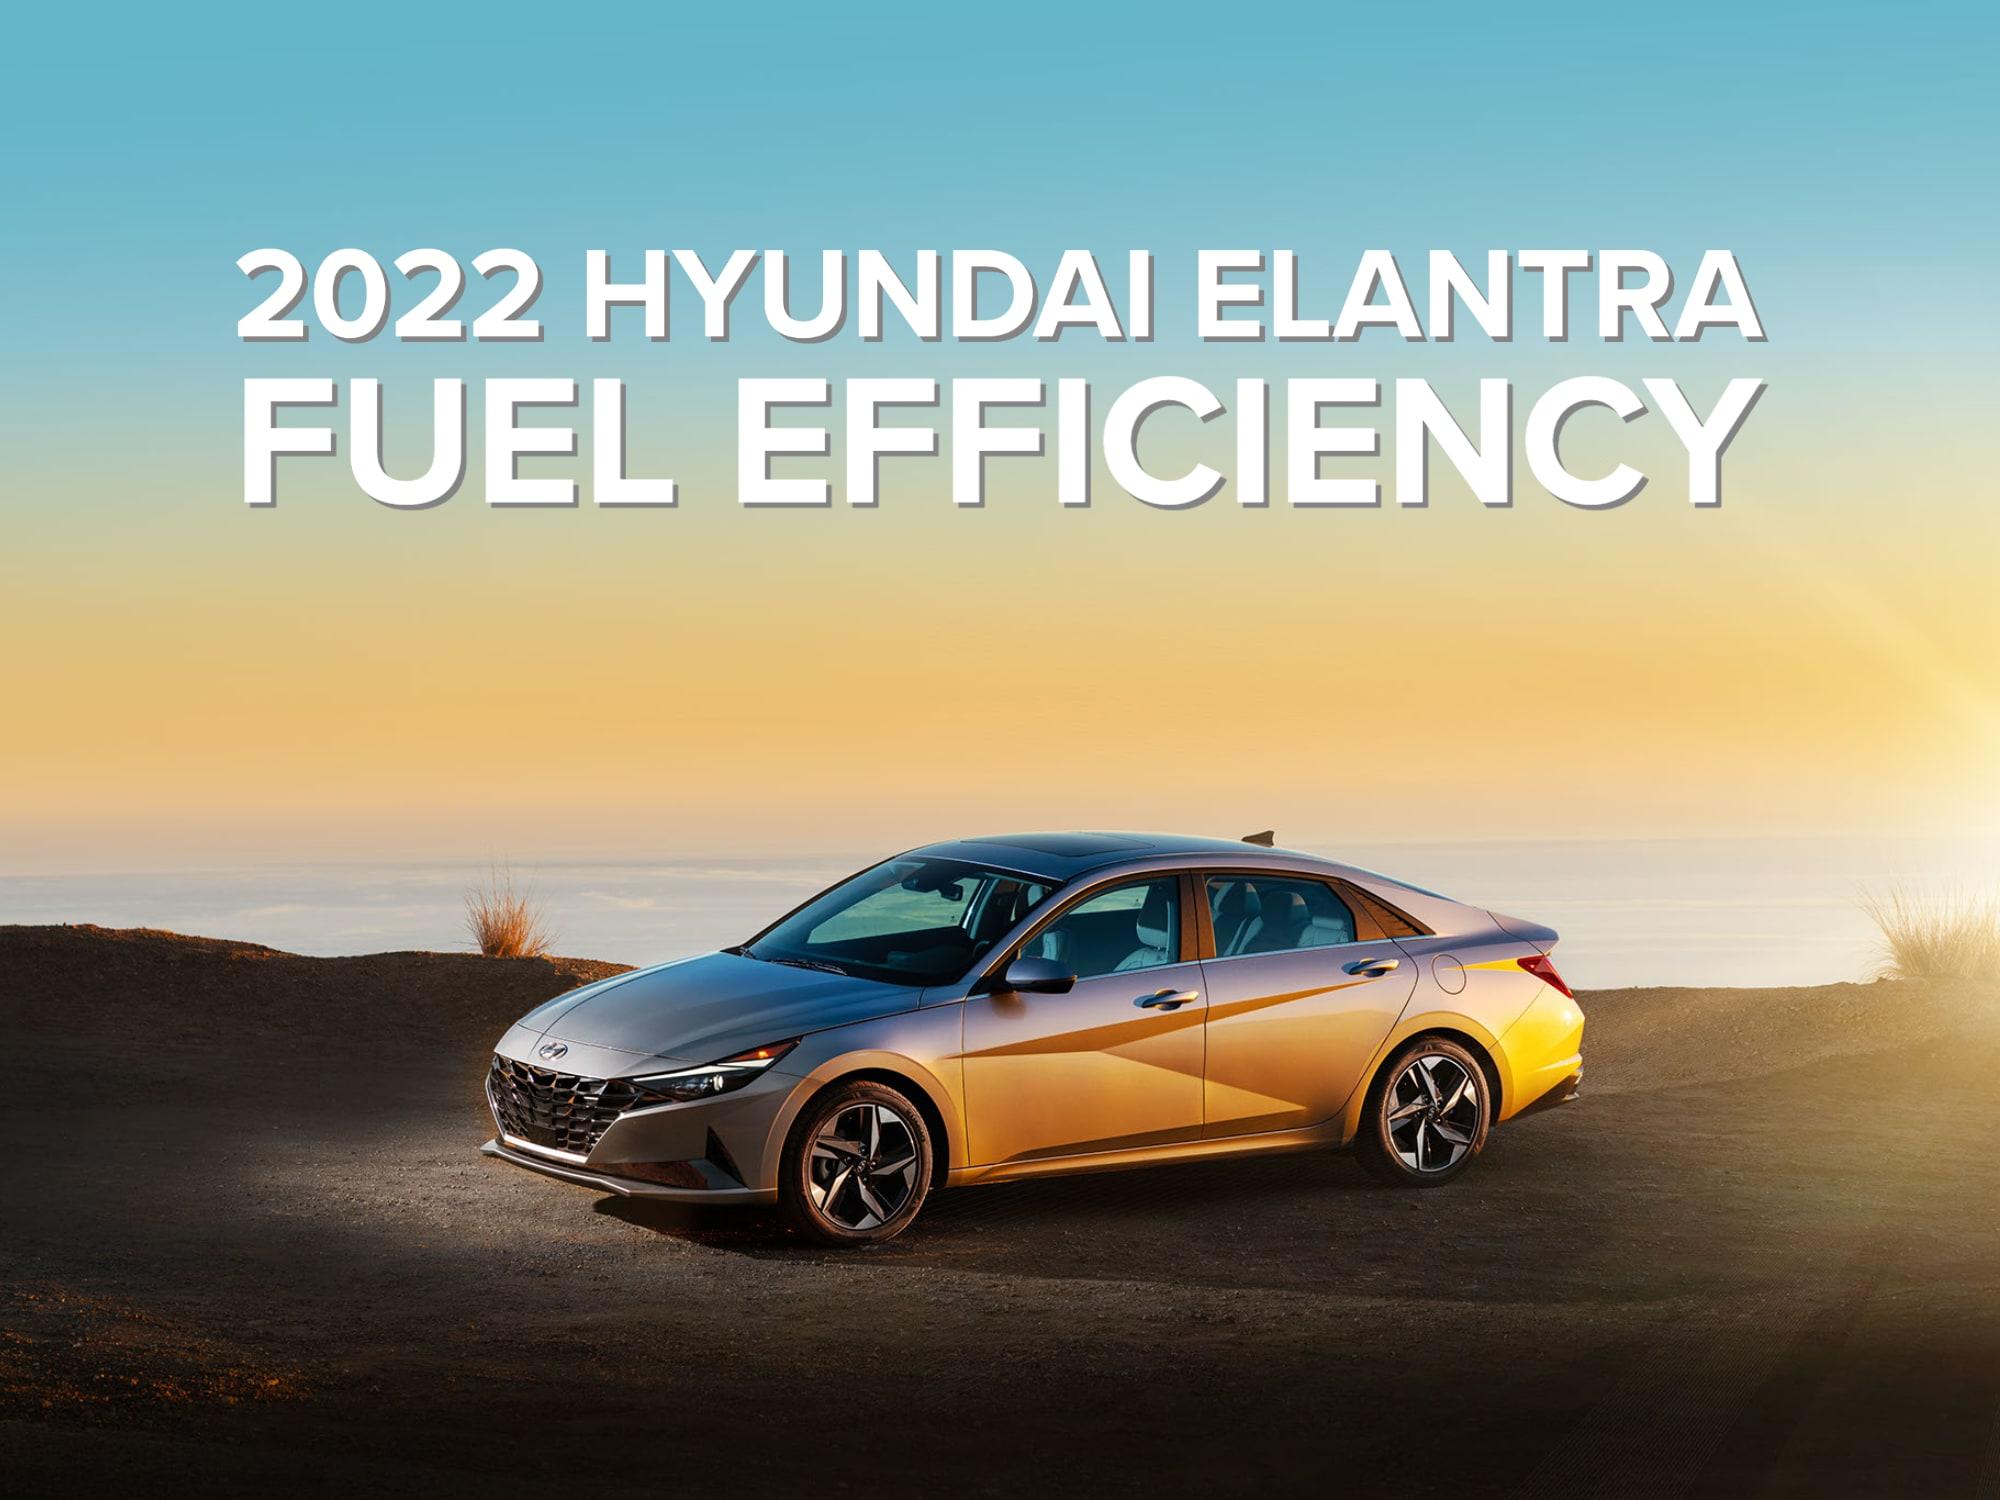 Front 3/4 View of Hyundai Elantra